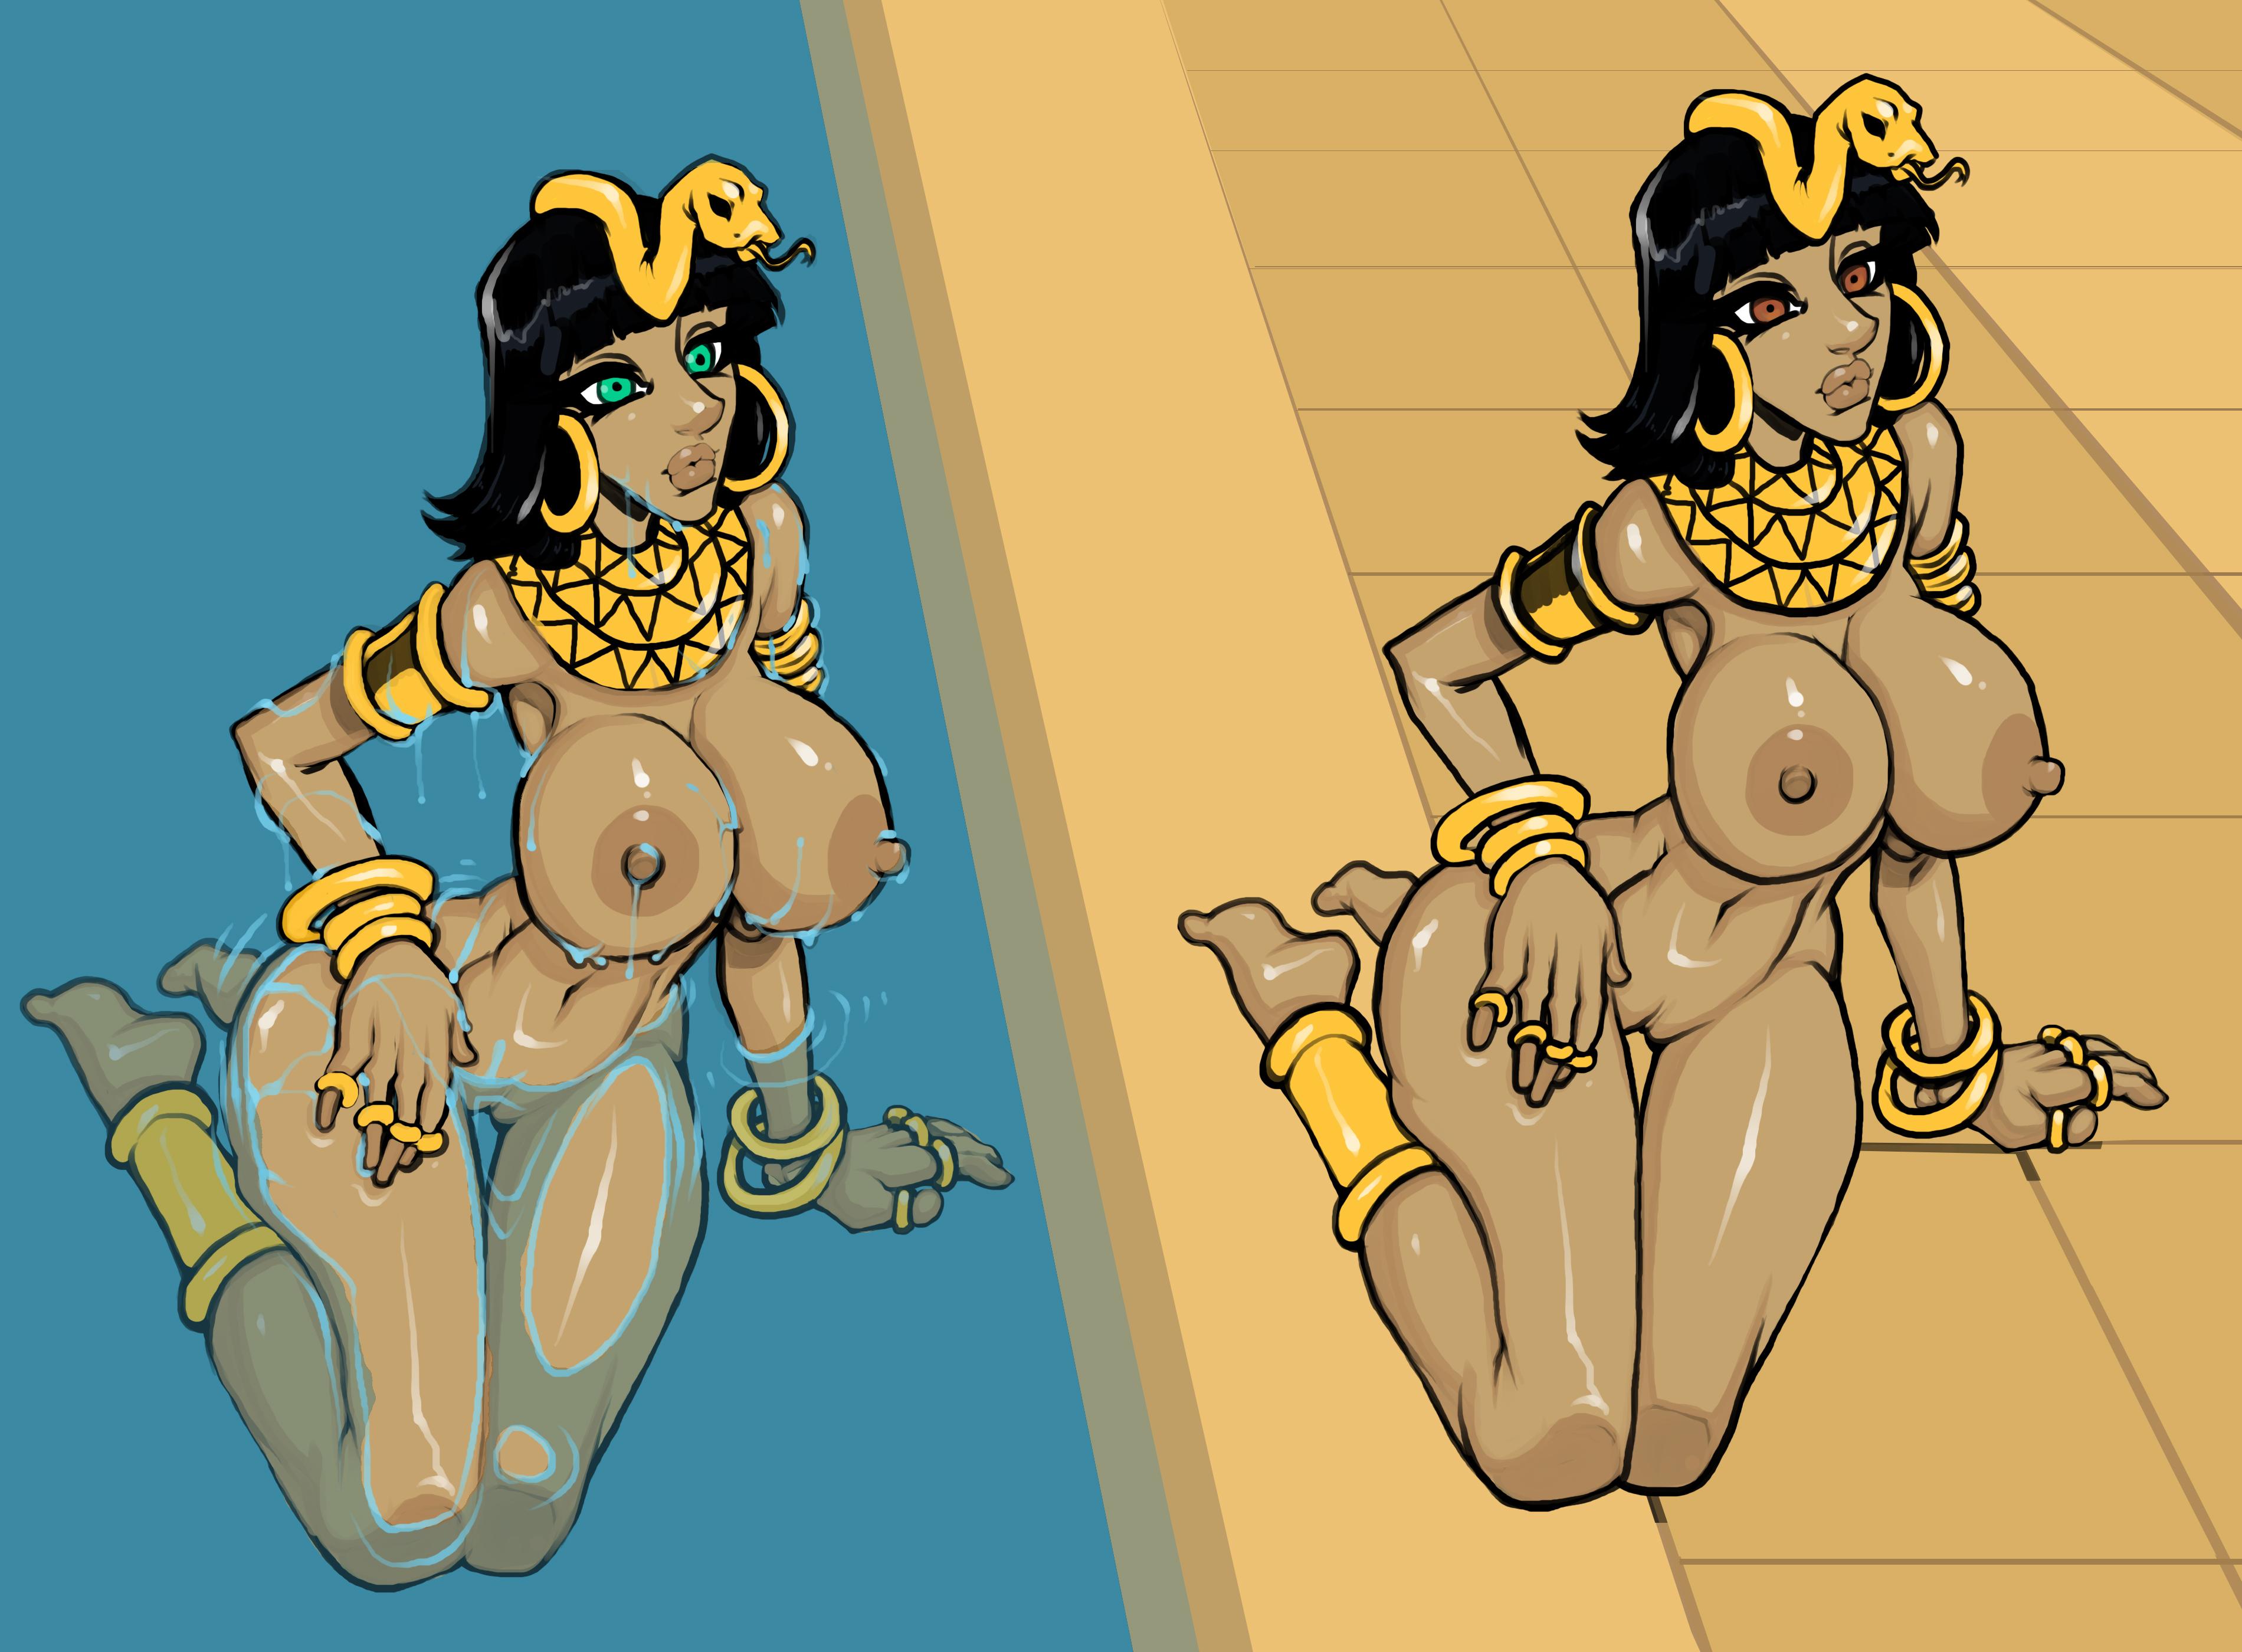 C: cleopatra